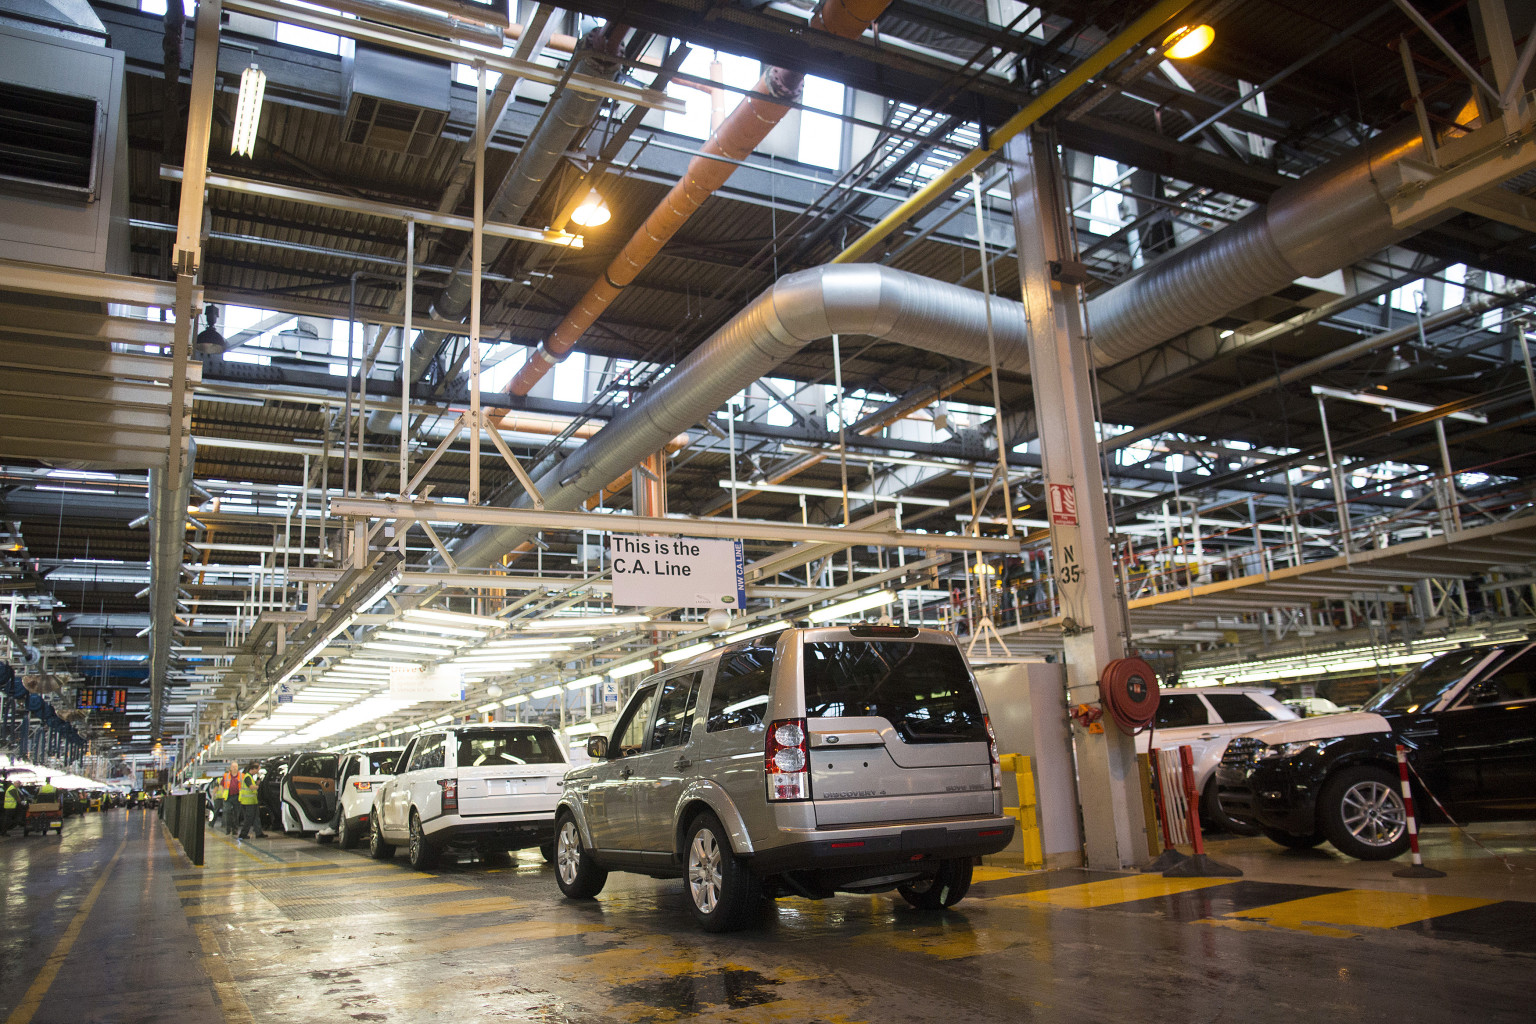 Sales Gain For Jaguar And Range Rover